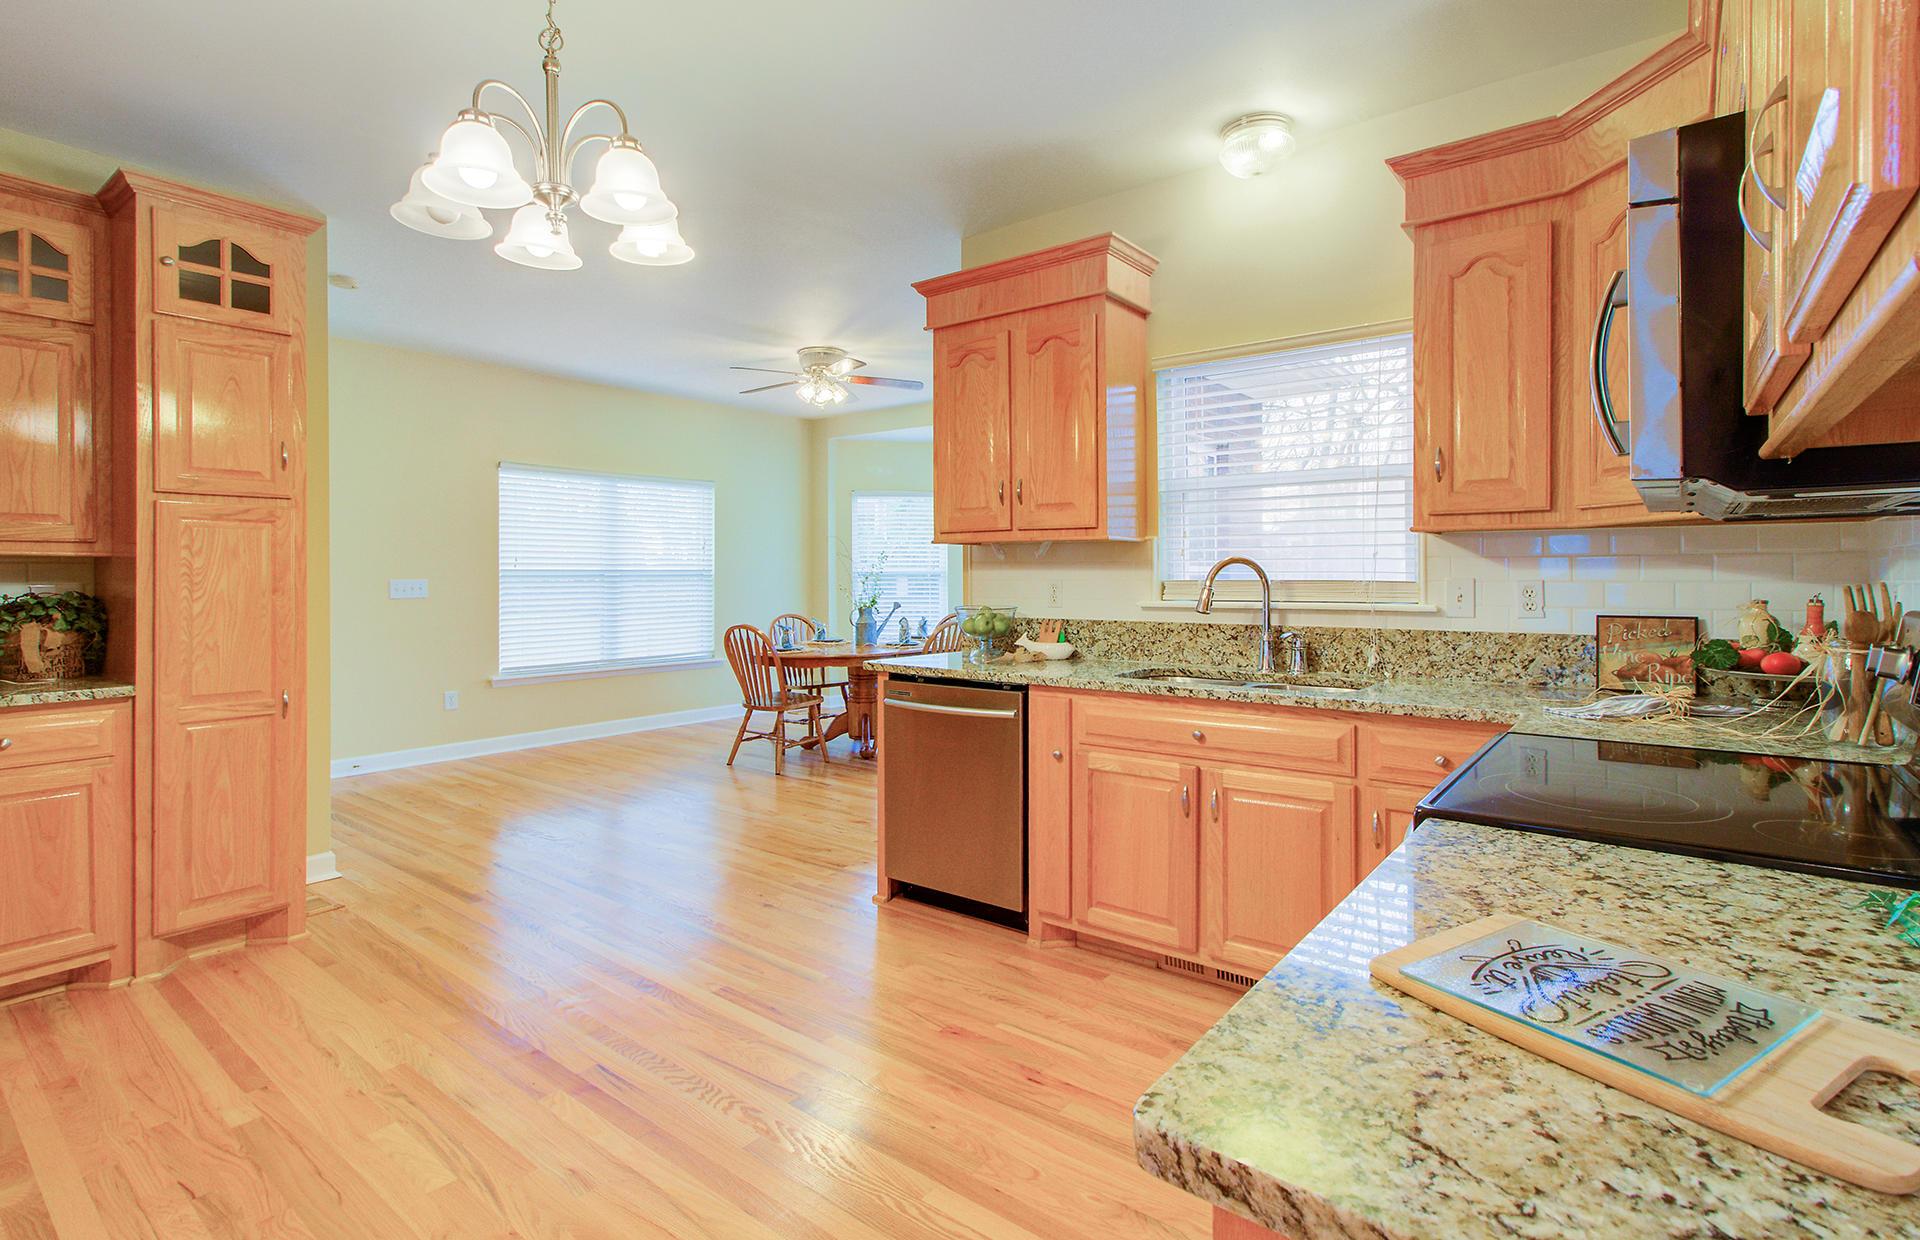 Bakers Landing Homes For Sale - 105 River Oak, North Charleston, SC - 41